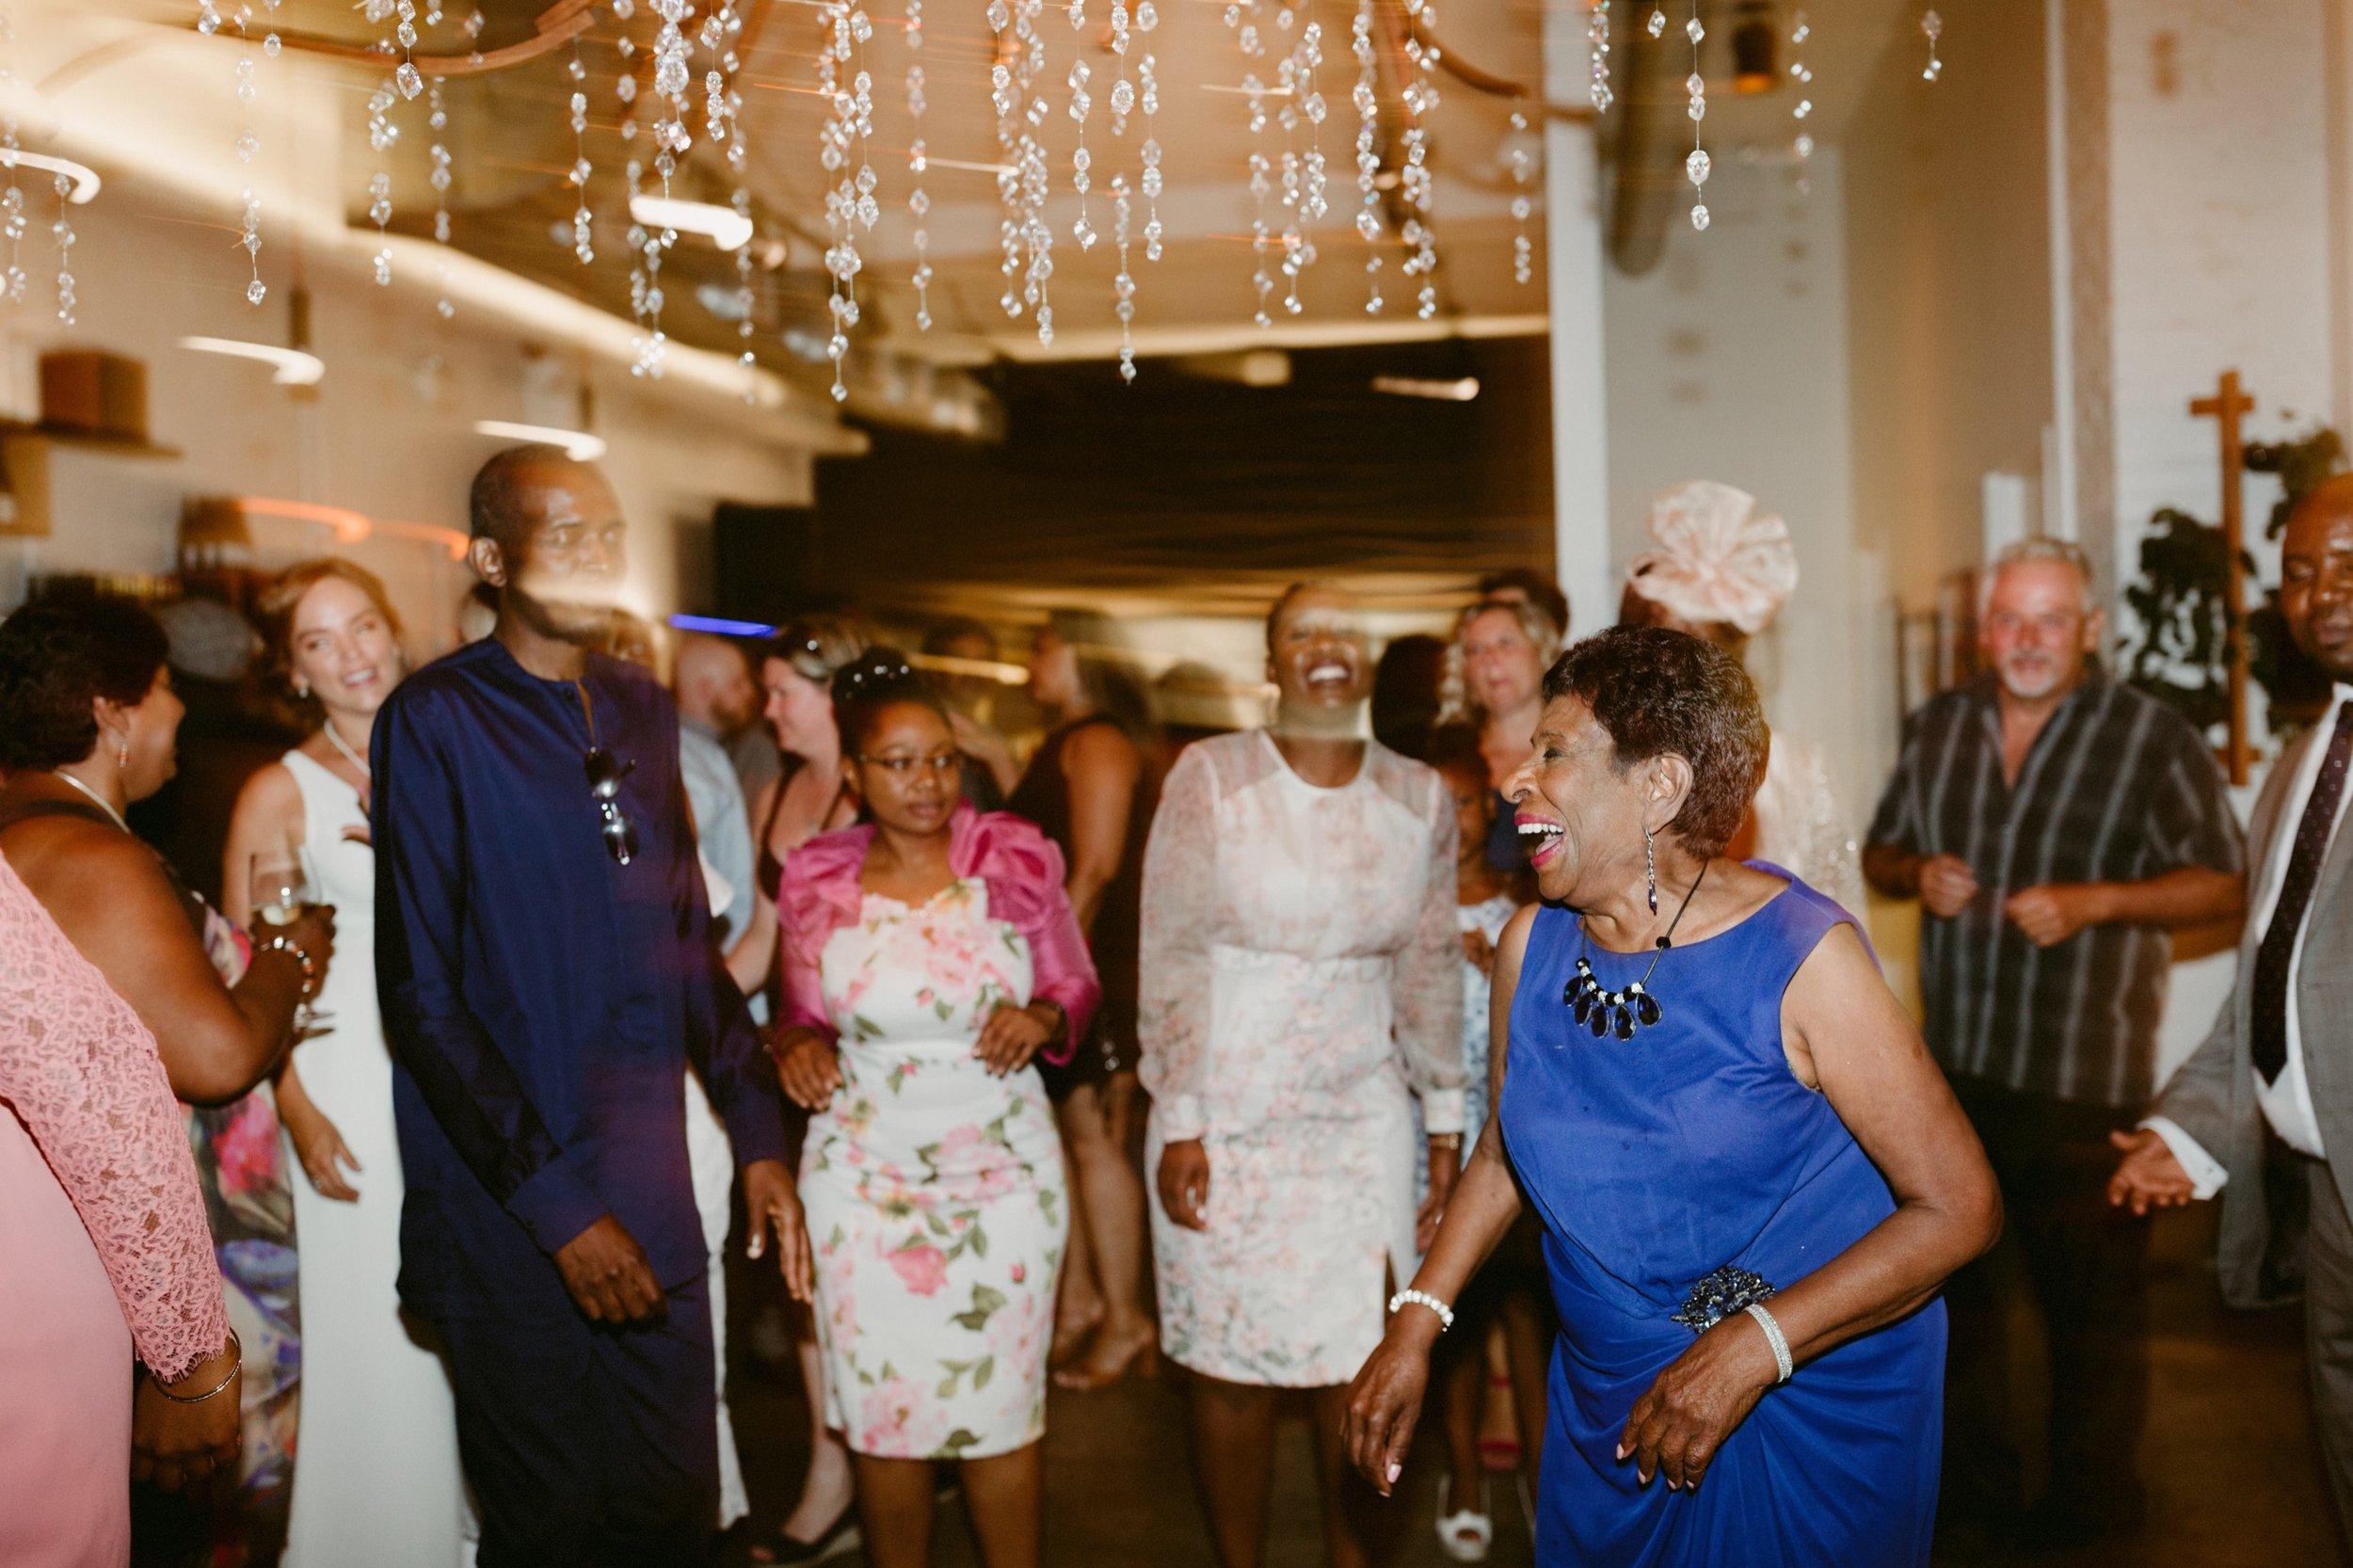 123_Spadina House Wedding (712 of 748)_intimate_Boehmer_Restaurant_Toronto_Wedding.jpg